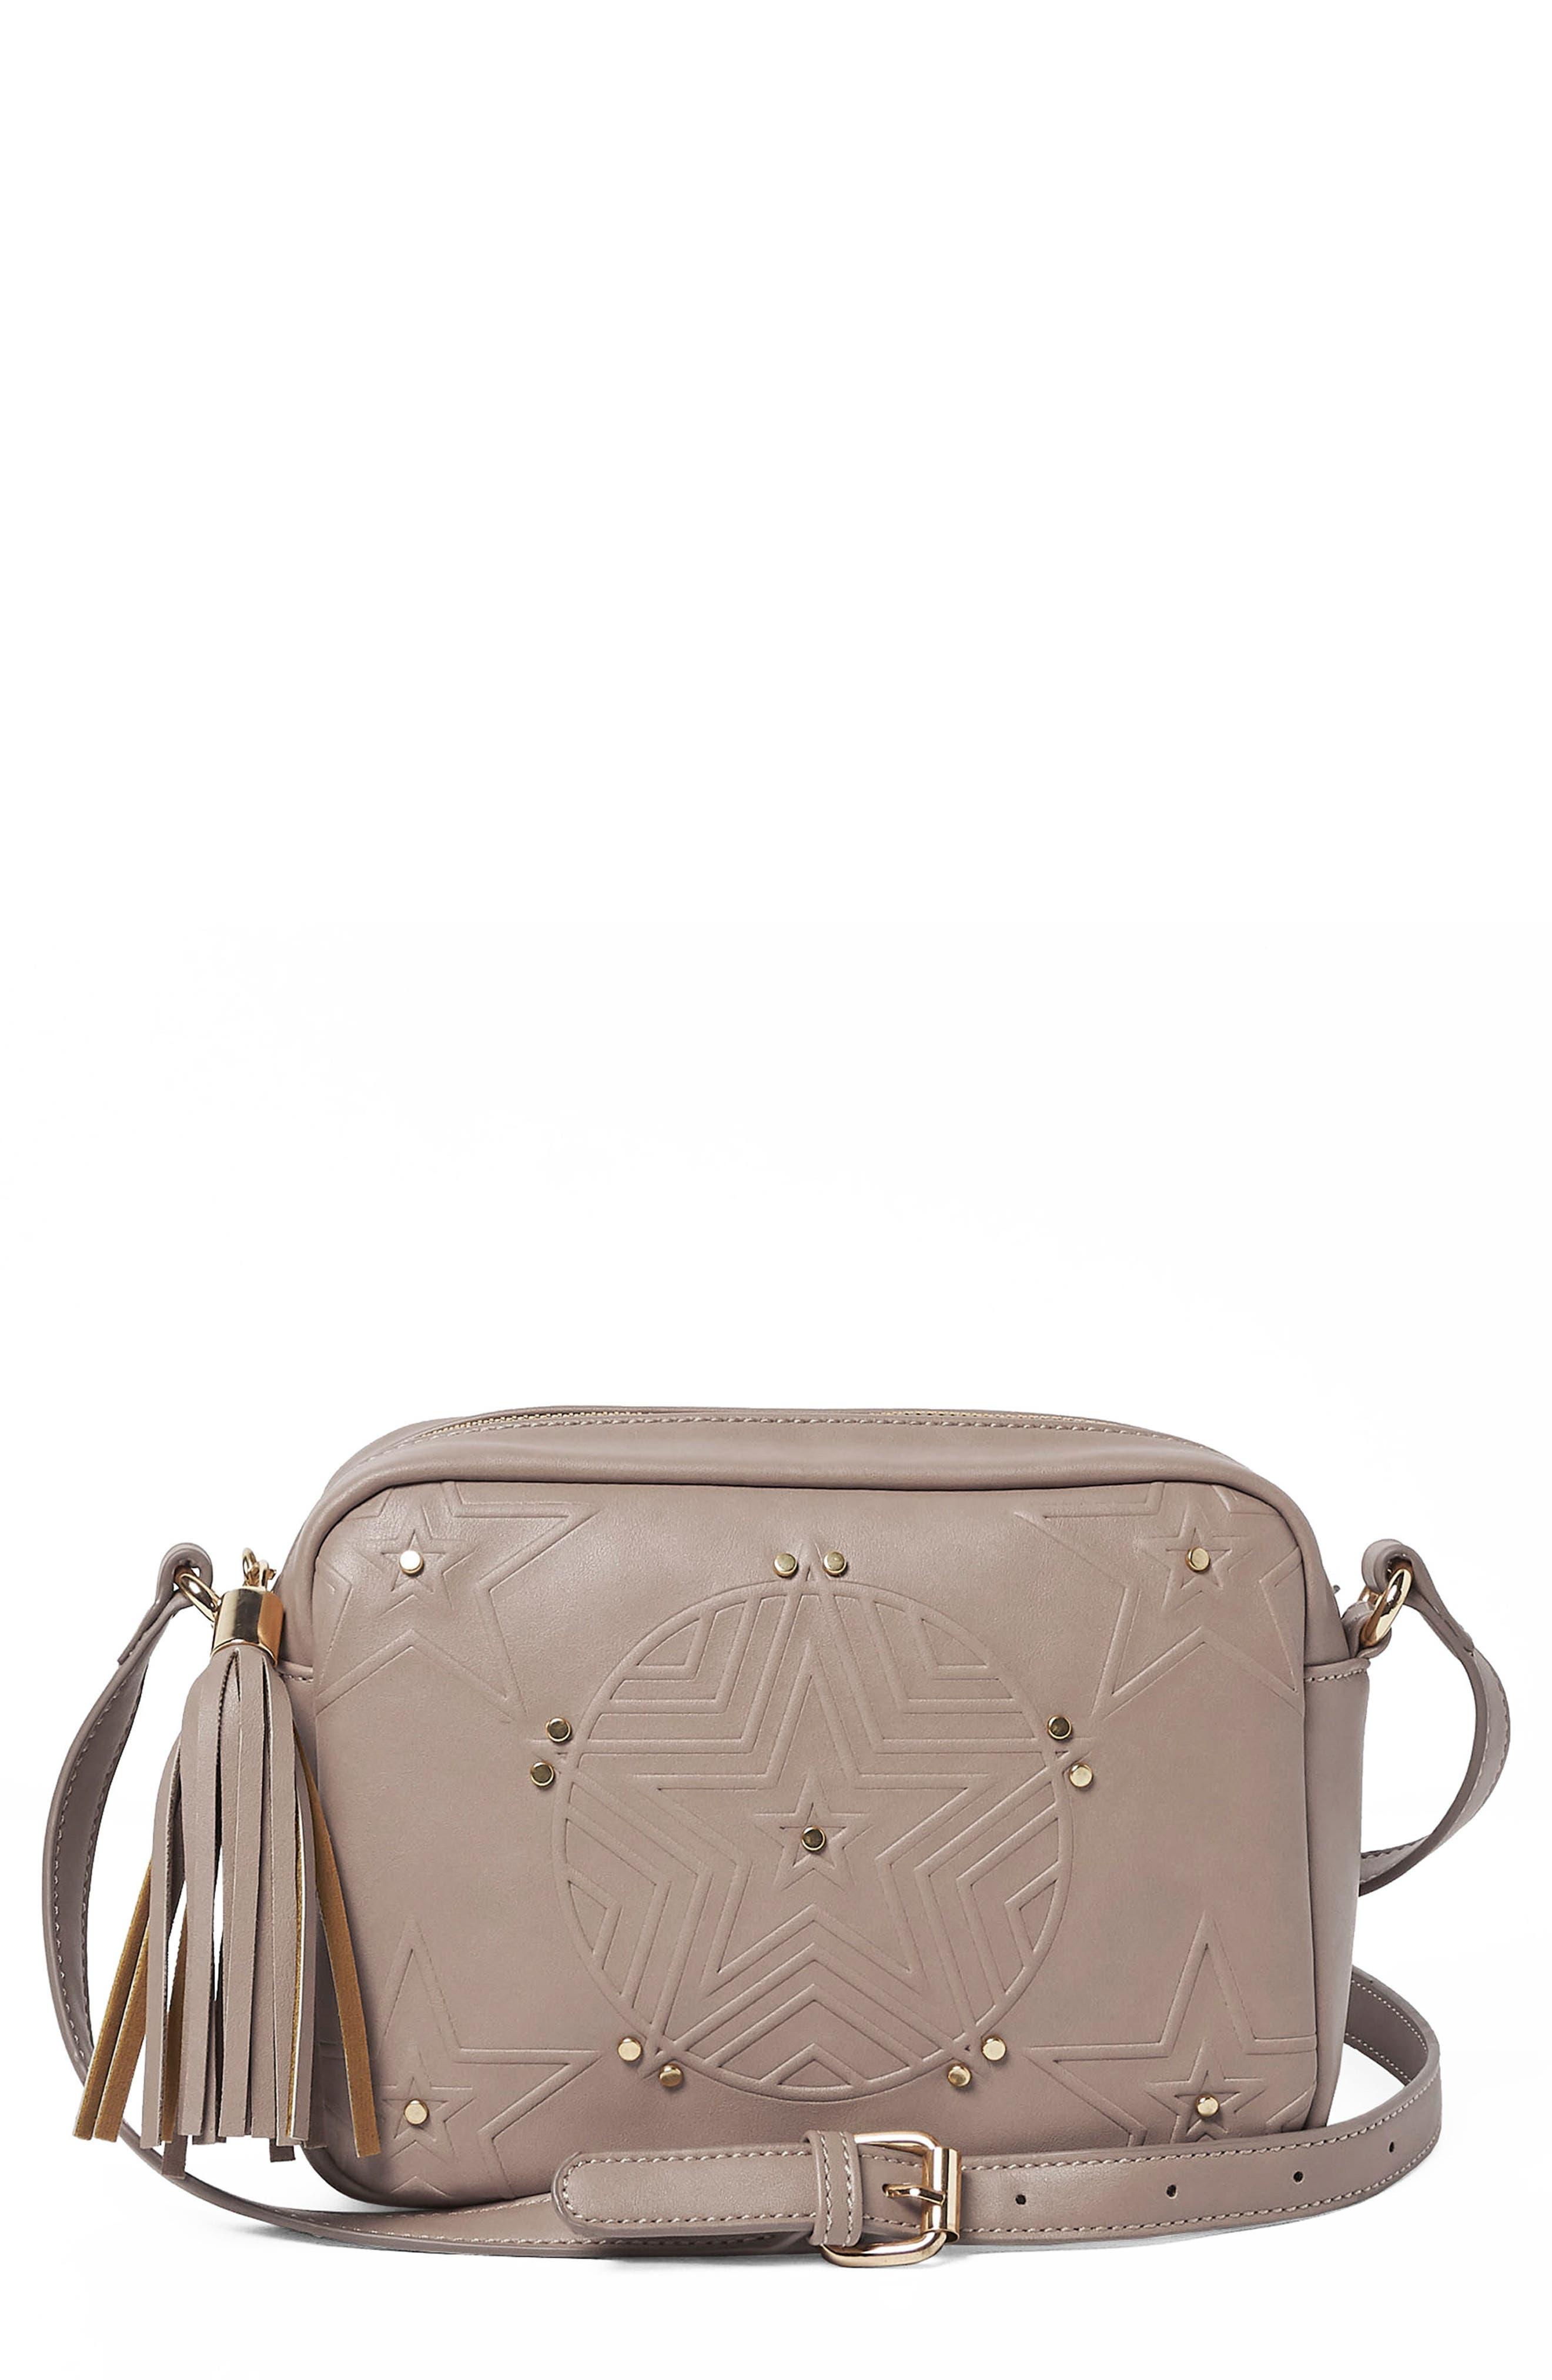 Stargazer Vegan Leather Crossbody Bag,                             Main thumbnail 2, color,